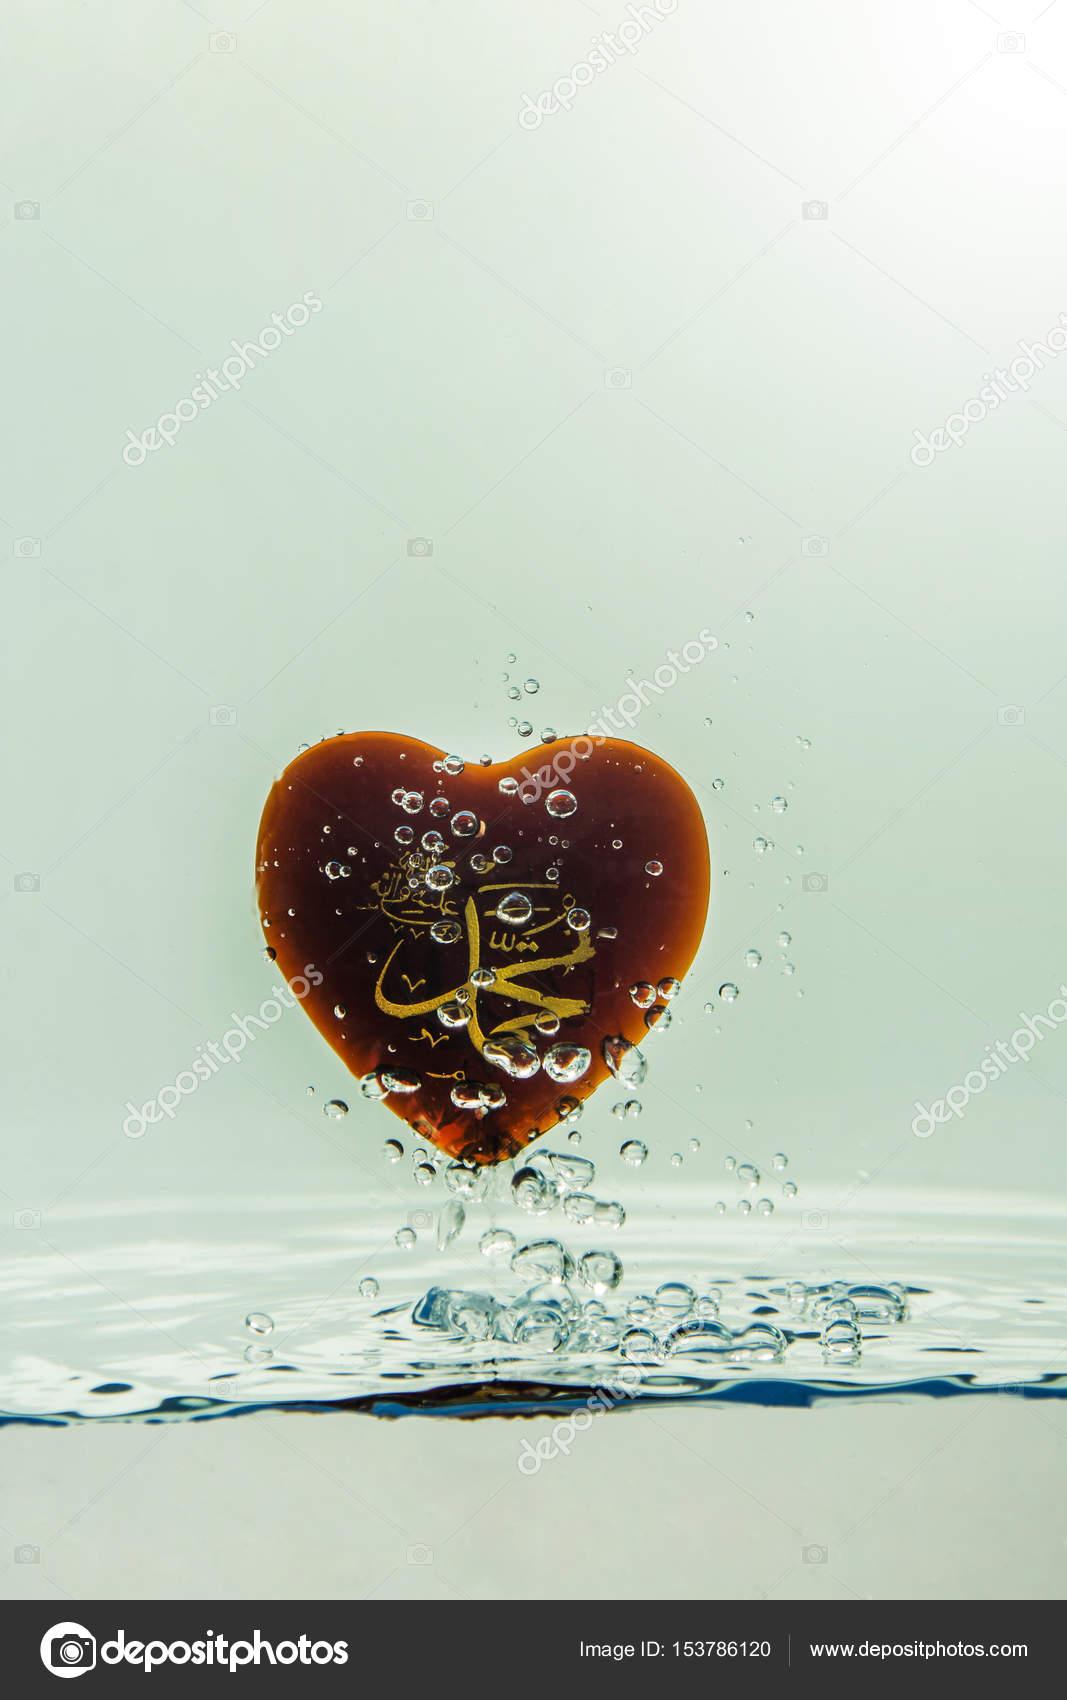 Muhammad Prophet Of Islam Symbol Water Splash With Bubbles Of